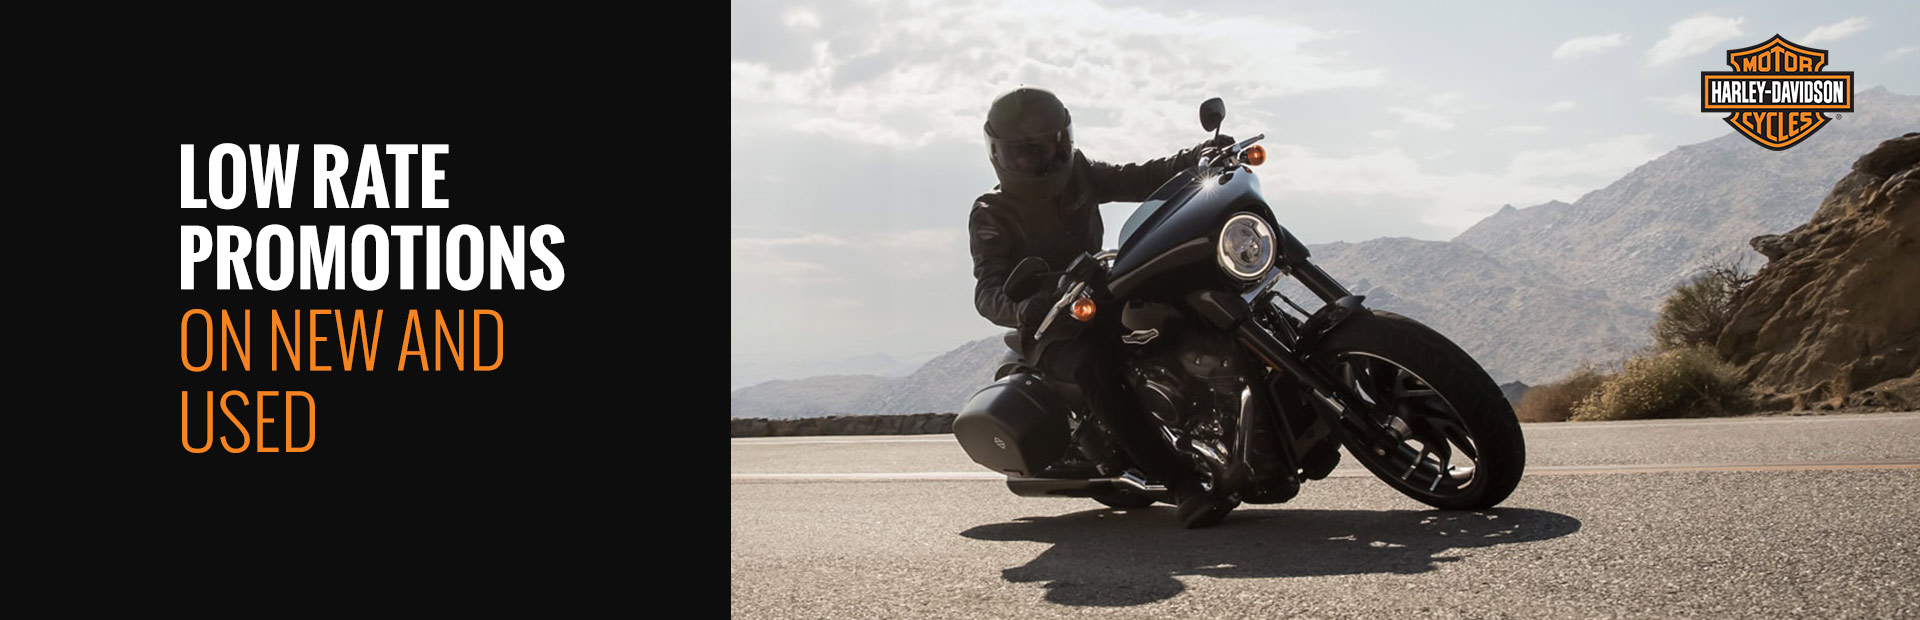 shop new used harley davidson motorcycles motorclothes parts rh greatlakeshd com Mechanic Repair Receipt Mobile Mechanic Repair